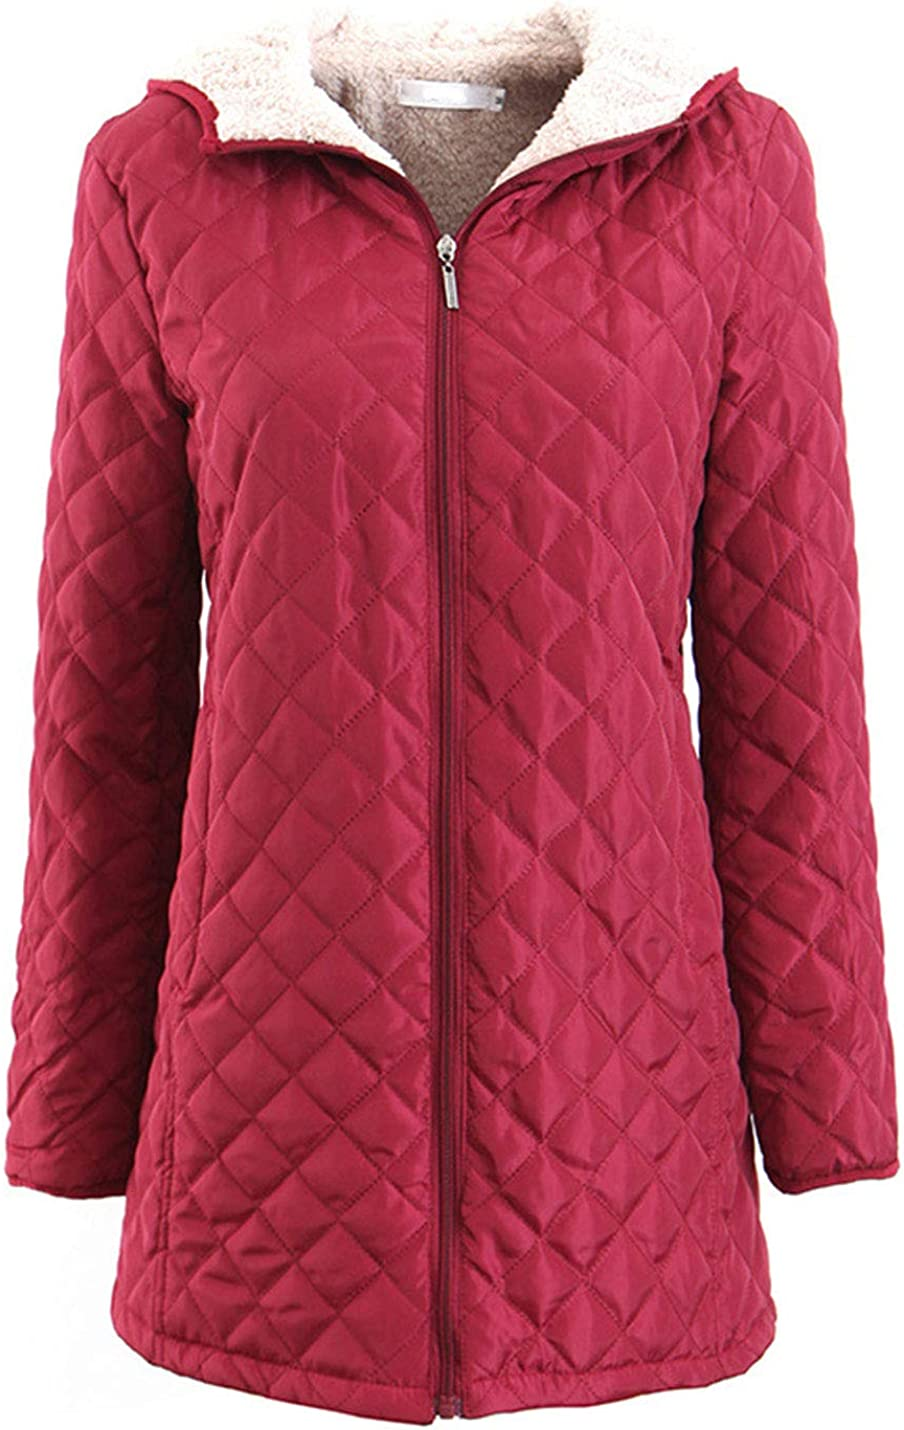 Flygo Women's Diamond Quilt Coat Hood Lined Seasonal Wrap Introduction Max 73% OFF Zipper Sherpa Fleece